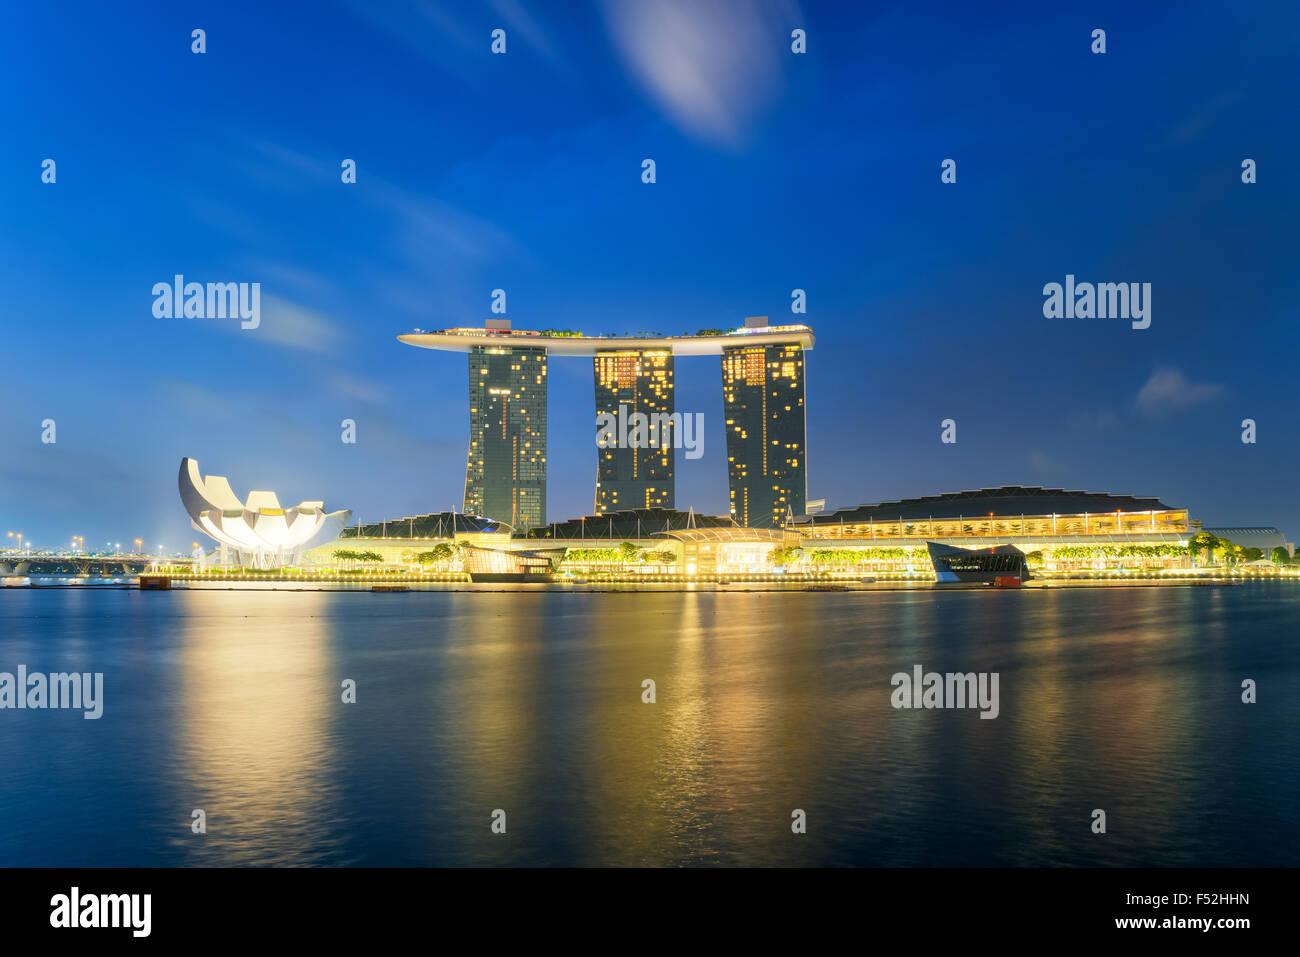 Wunderschönen Sonnenaufgang in Marina Bay in Singapur Stockbild